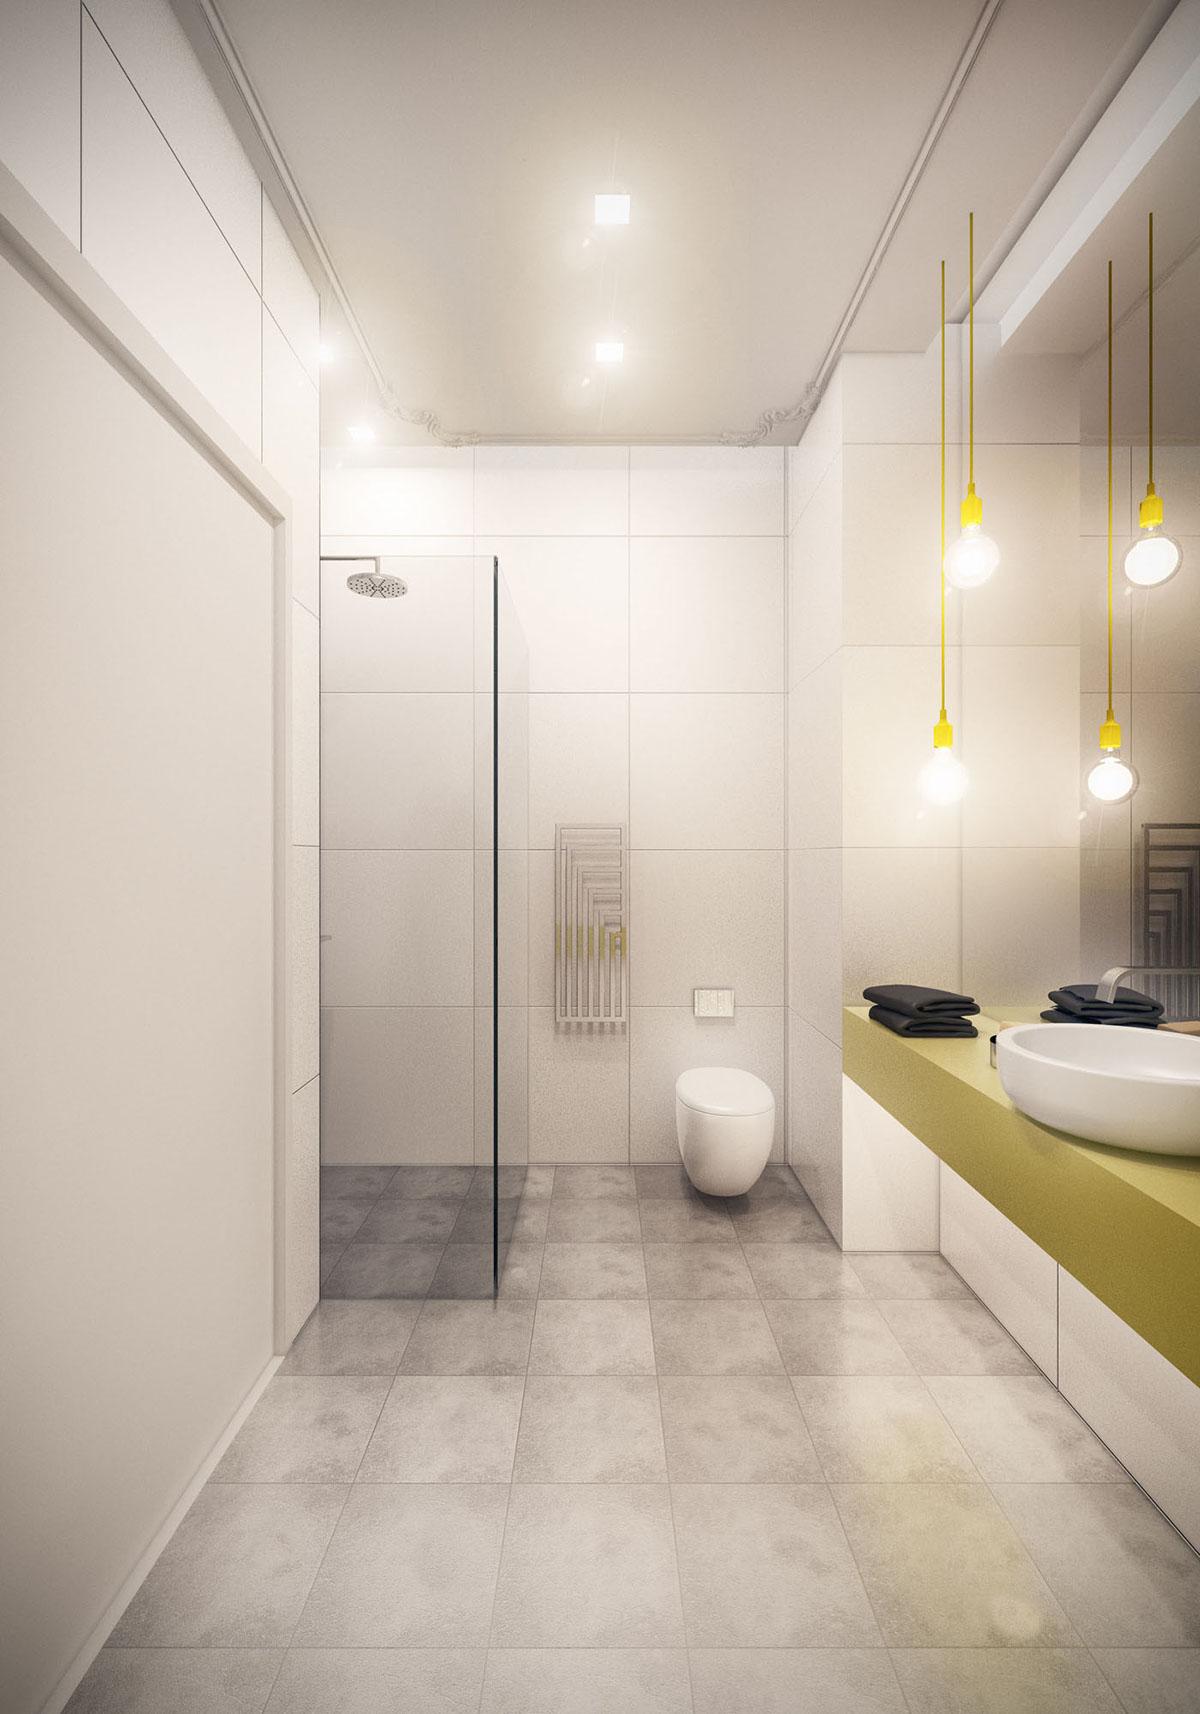 Bathroom of small modern apartment 1 on Behance on Small Apartment Bathroom  id=41401